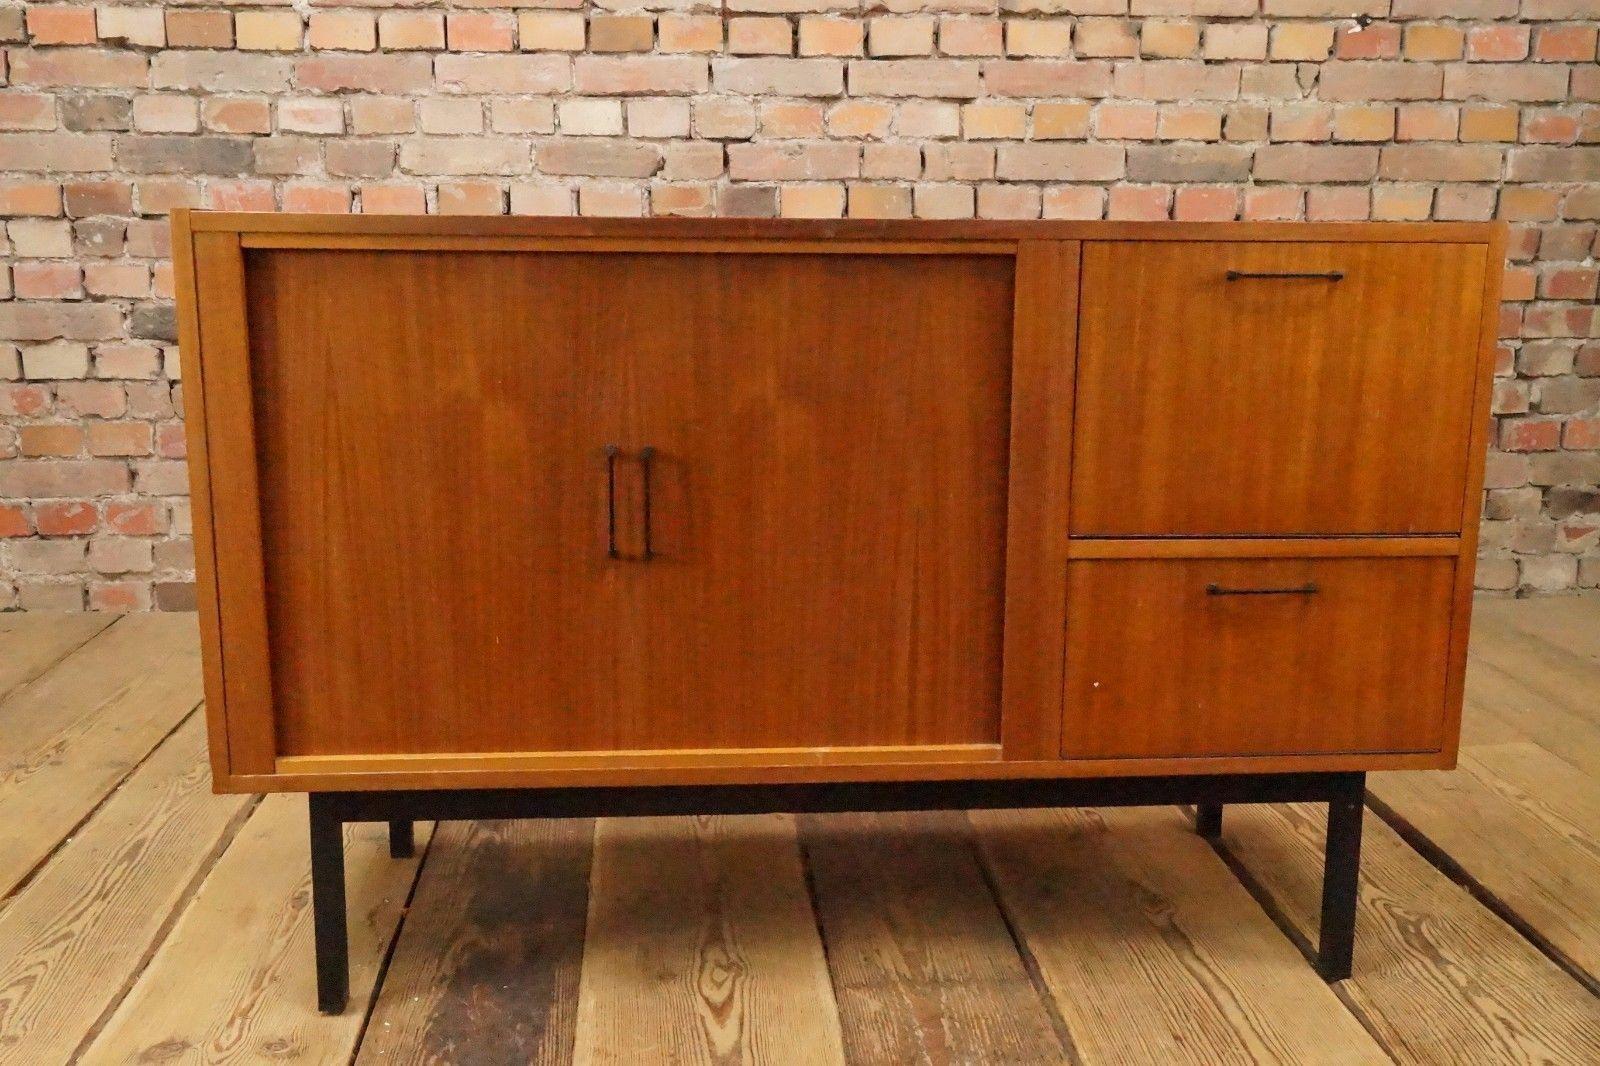 60er Danish Teak Sideboard Credenza Anrichte Kommode Mid Century Vintage 60s 2 Side Board Teak Und Teak Holz